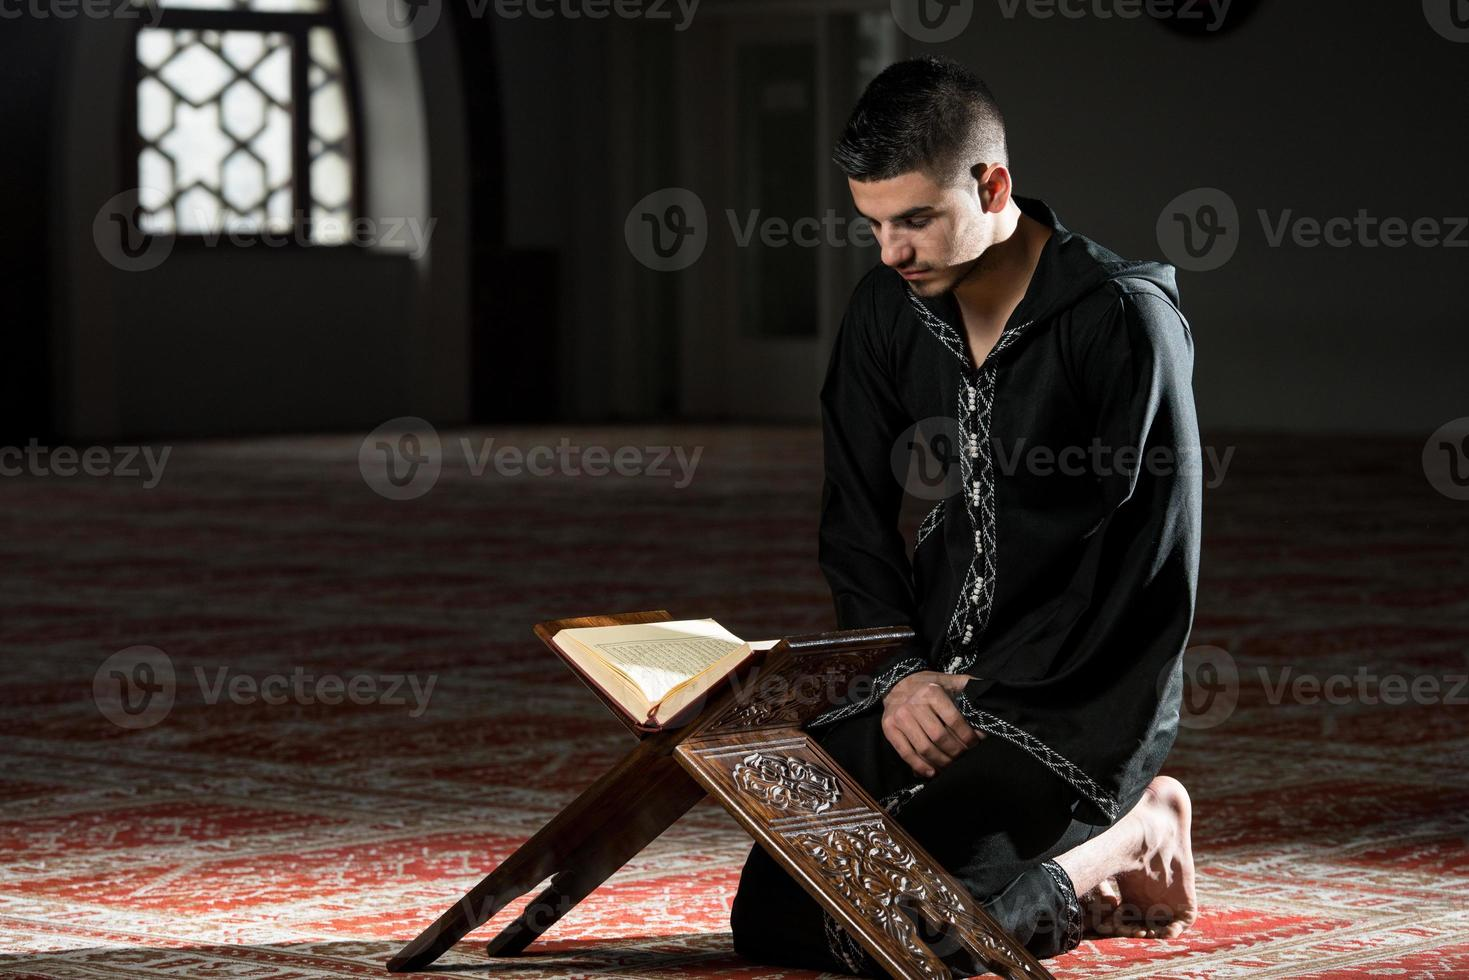 ung muslimman som läser koranen foto